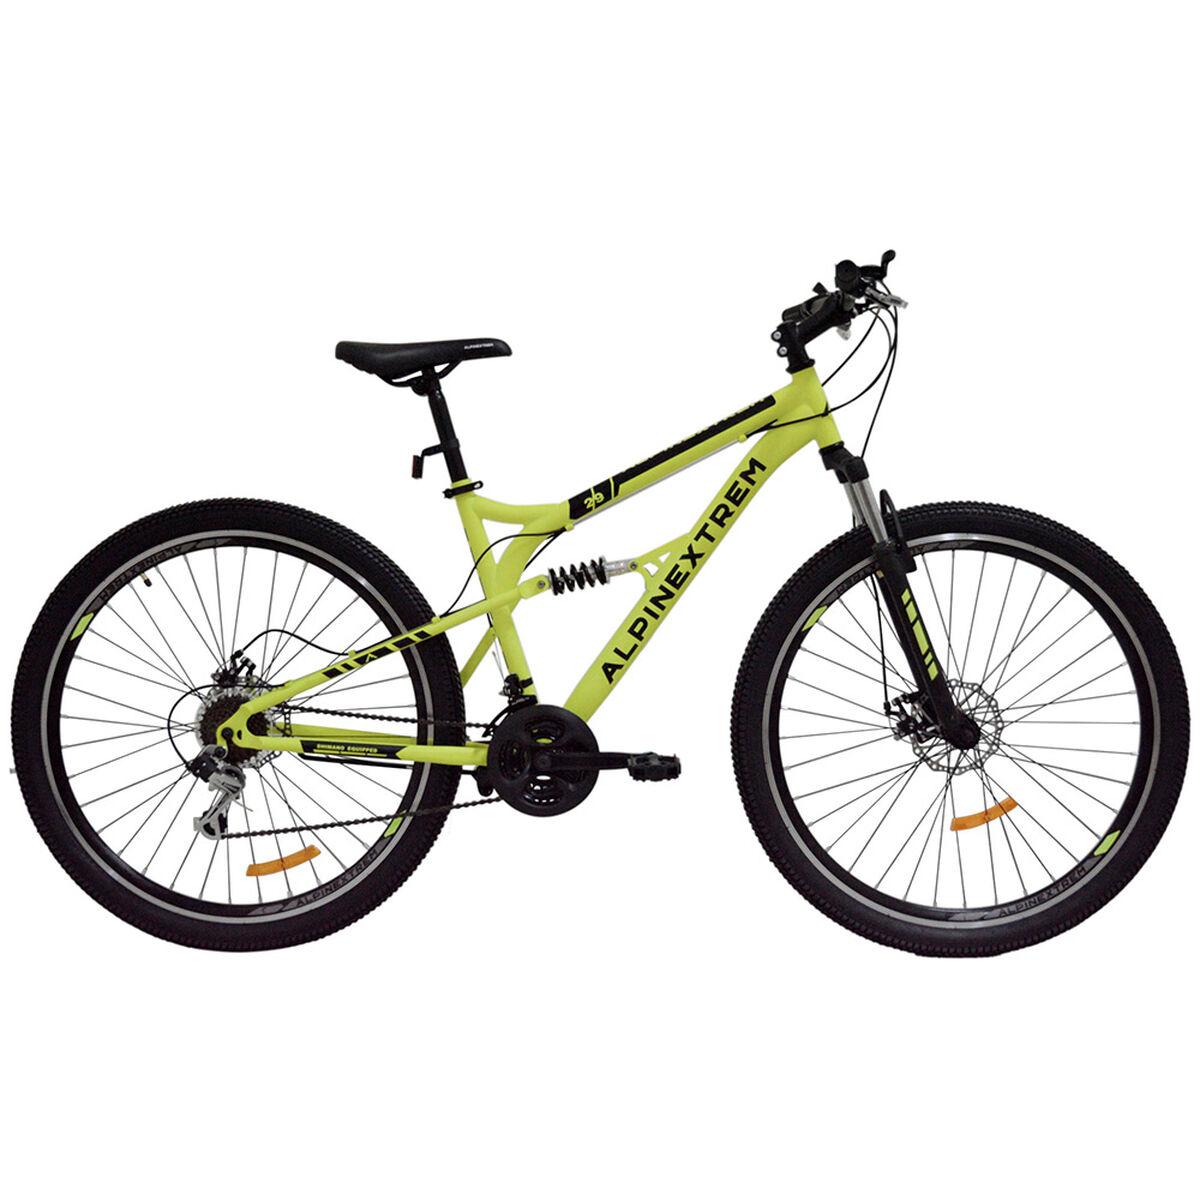 Bicicleta Alpinextrem Hombre Unlimitless Aro 29